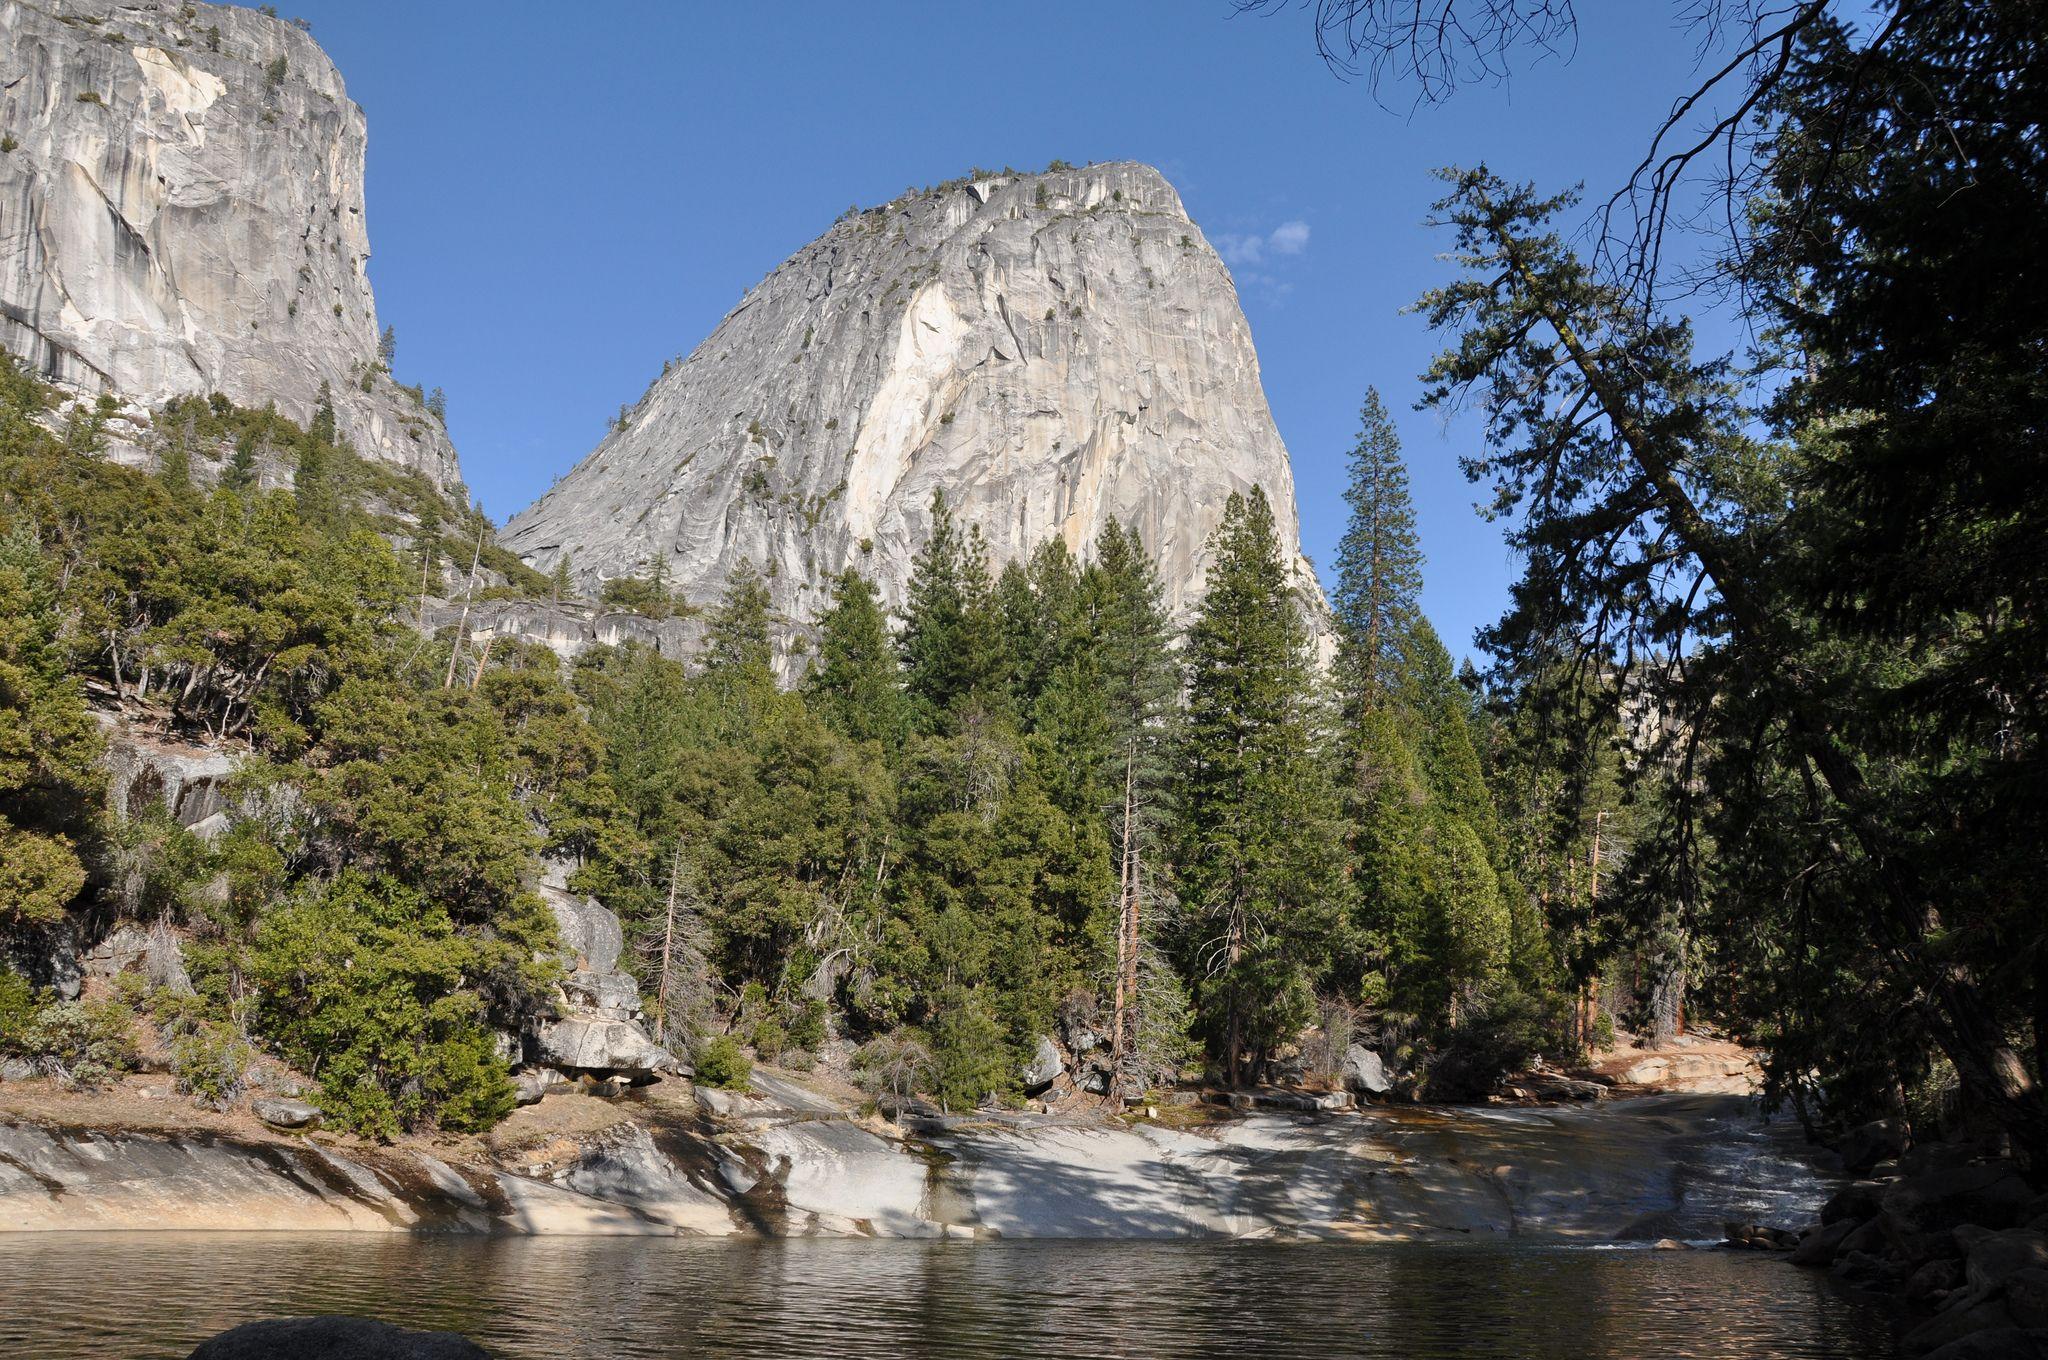 Yosemite National Park | File:Emerald Pool, Yosemite National Park.jpg - Wikimedia Commons